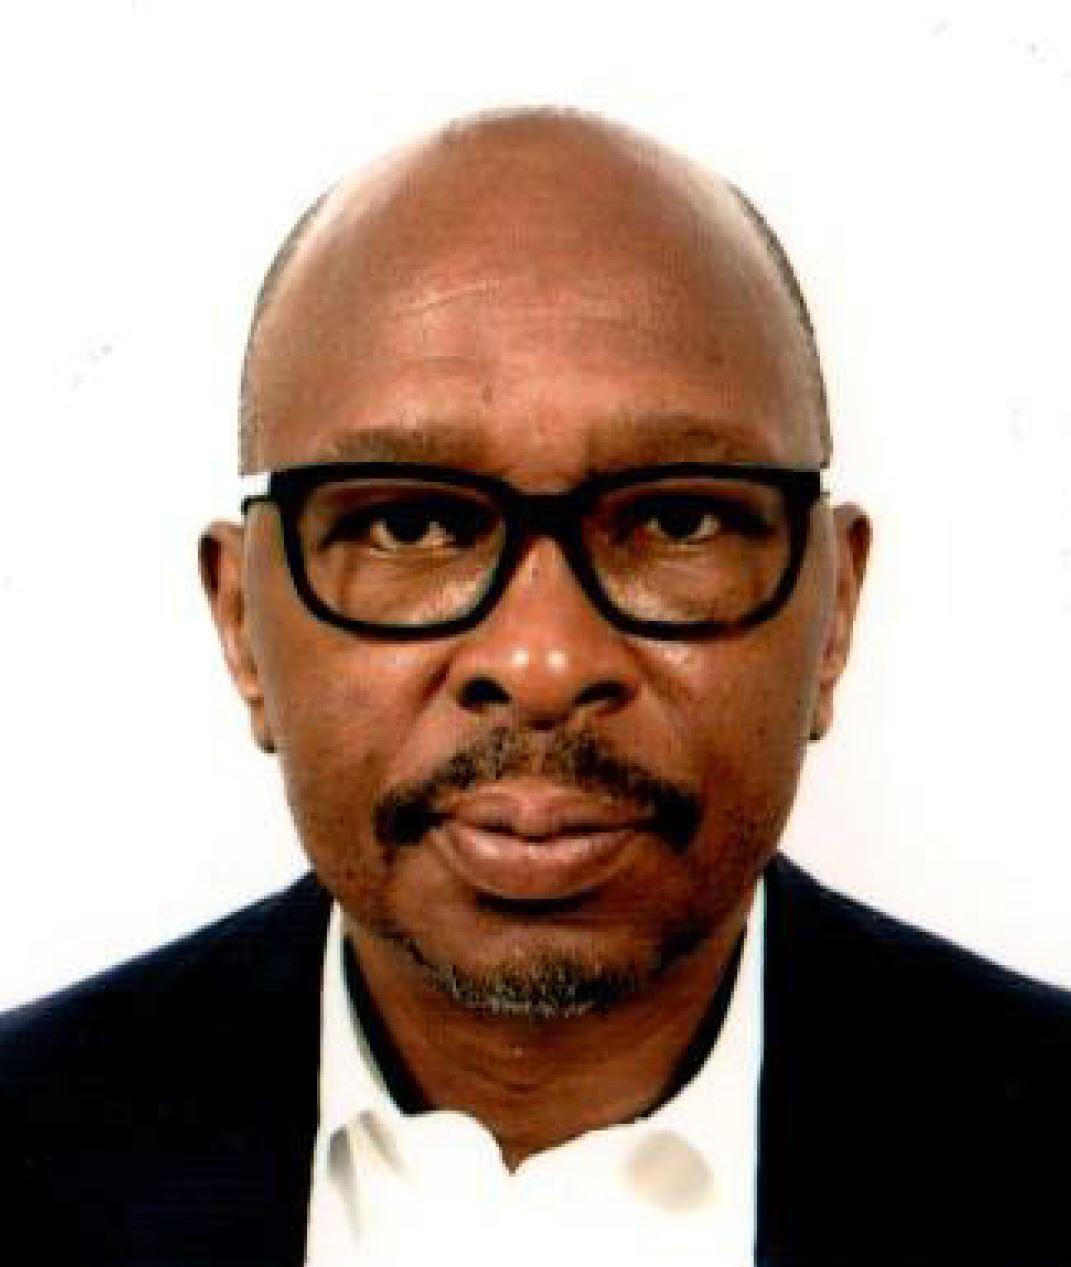 https://cottonmadeinafrica.org/wp-content/uploads/Jean-Claude.jpg